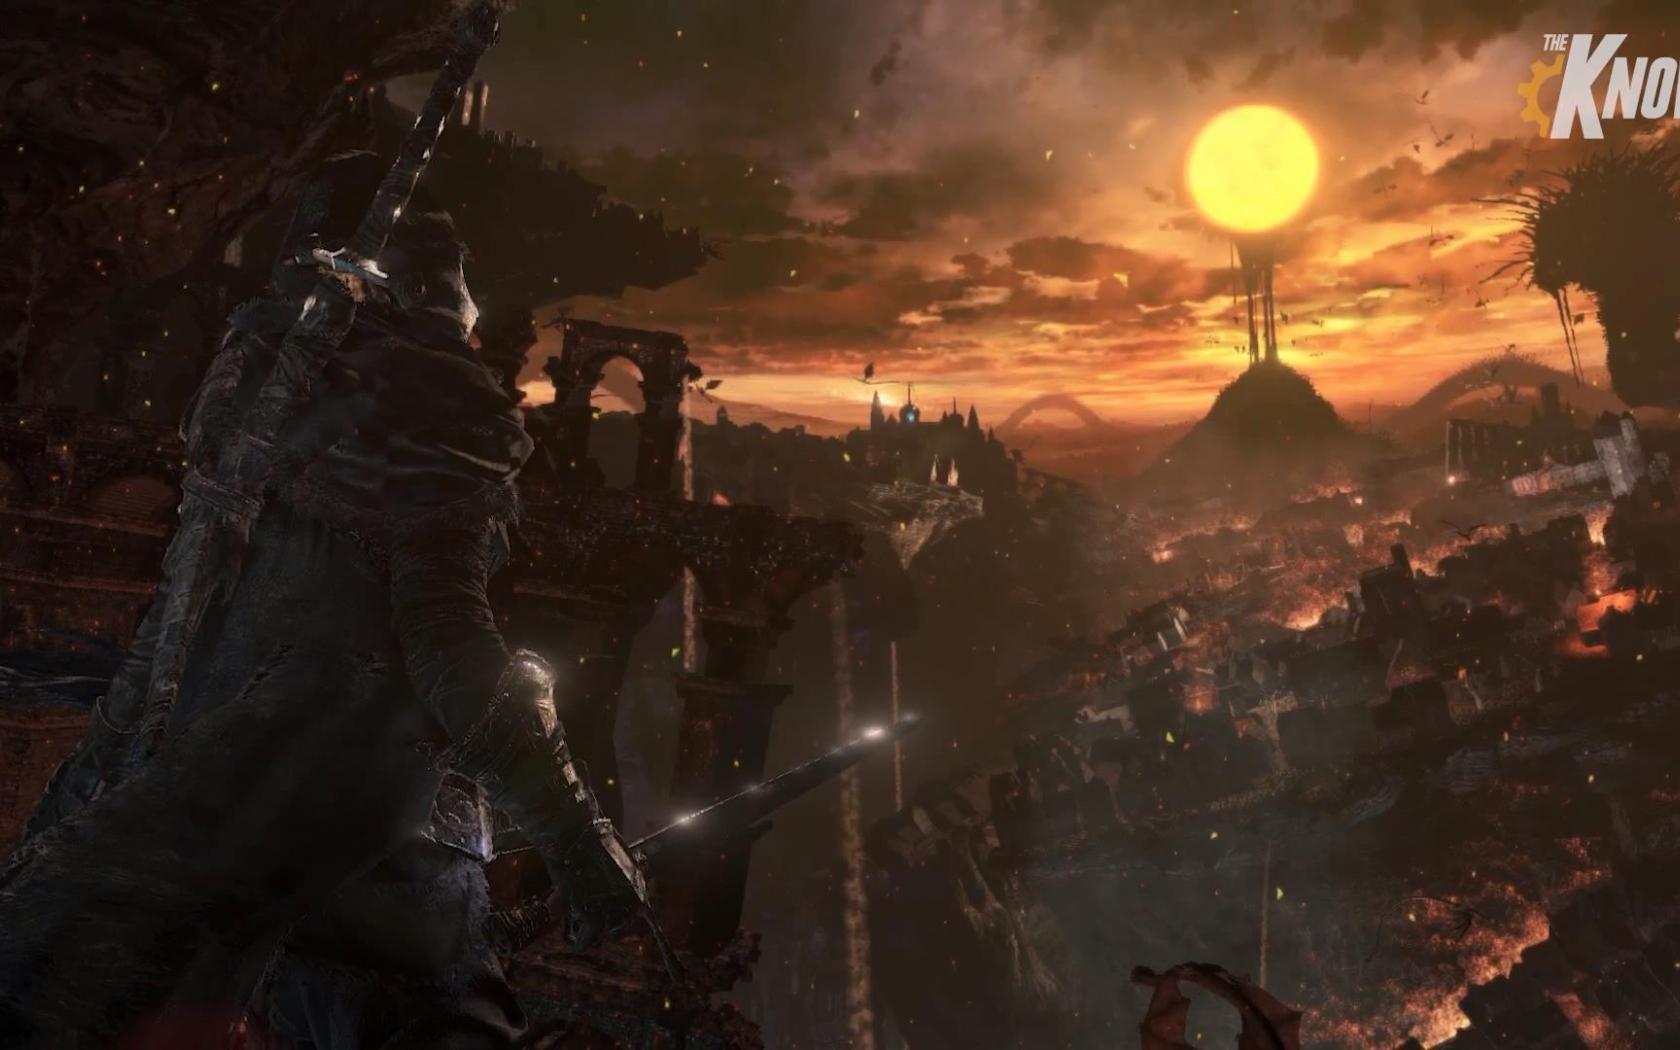 Free Download Dark Souls Iii Eclipse Screenshot Full Hd 1920x1080